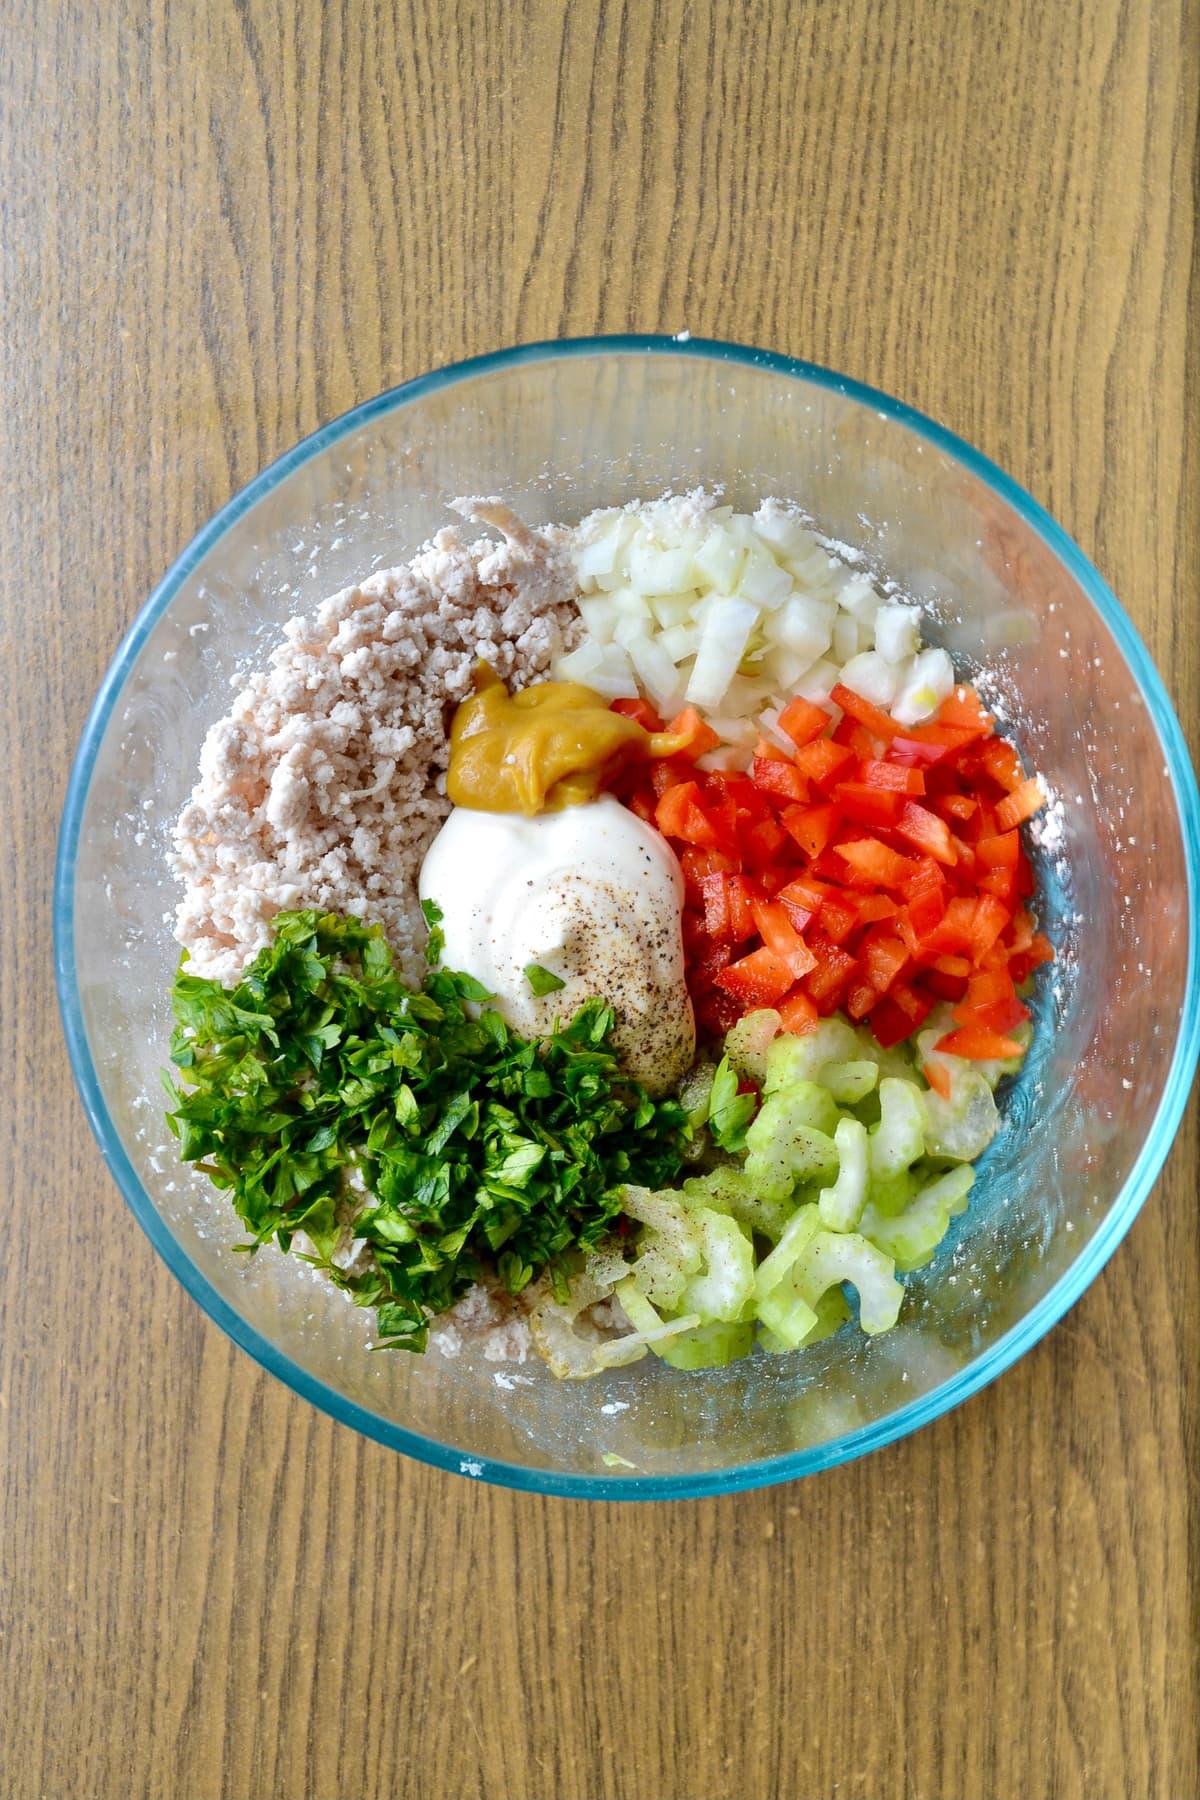 Easy Keto Chicken Salad ingredients